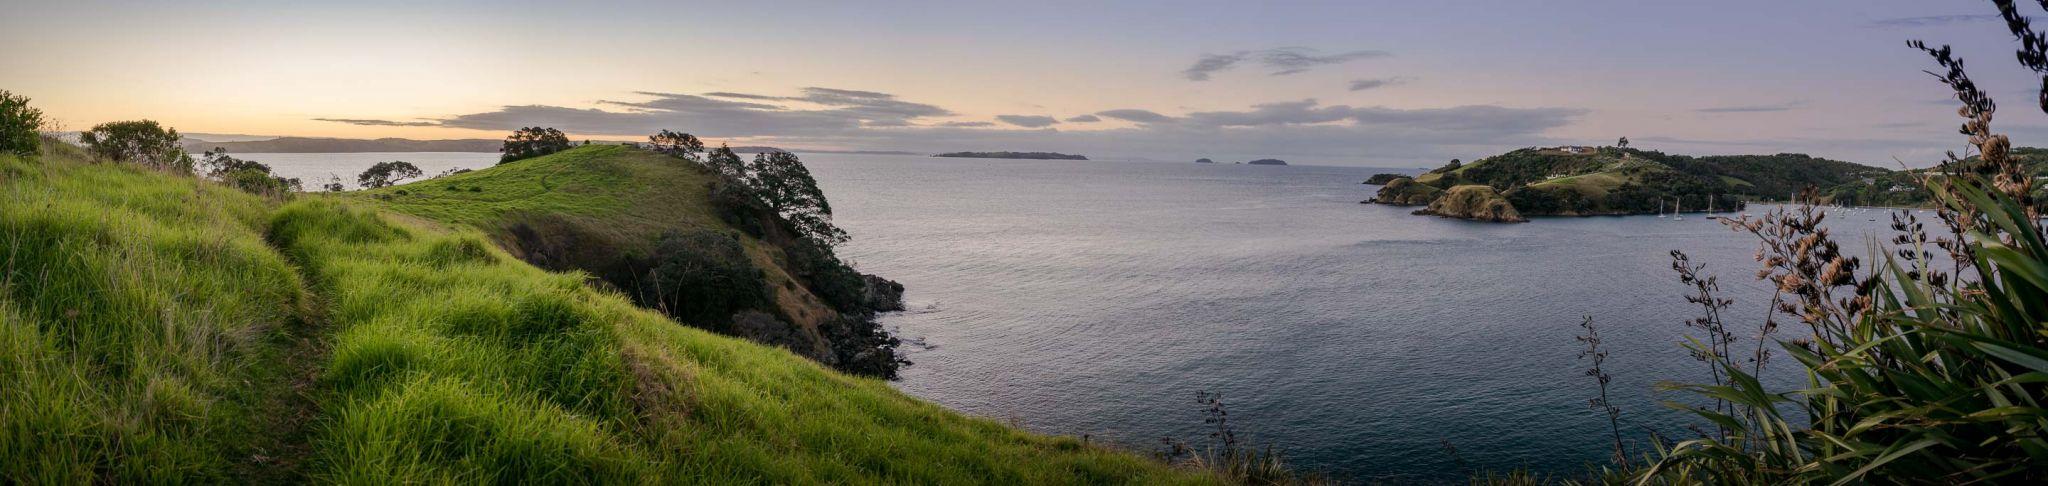 Harbour Bay, Waiheke Island, New Zealand